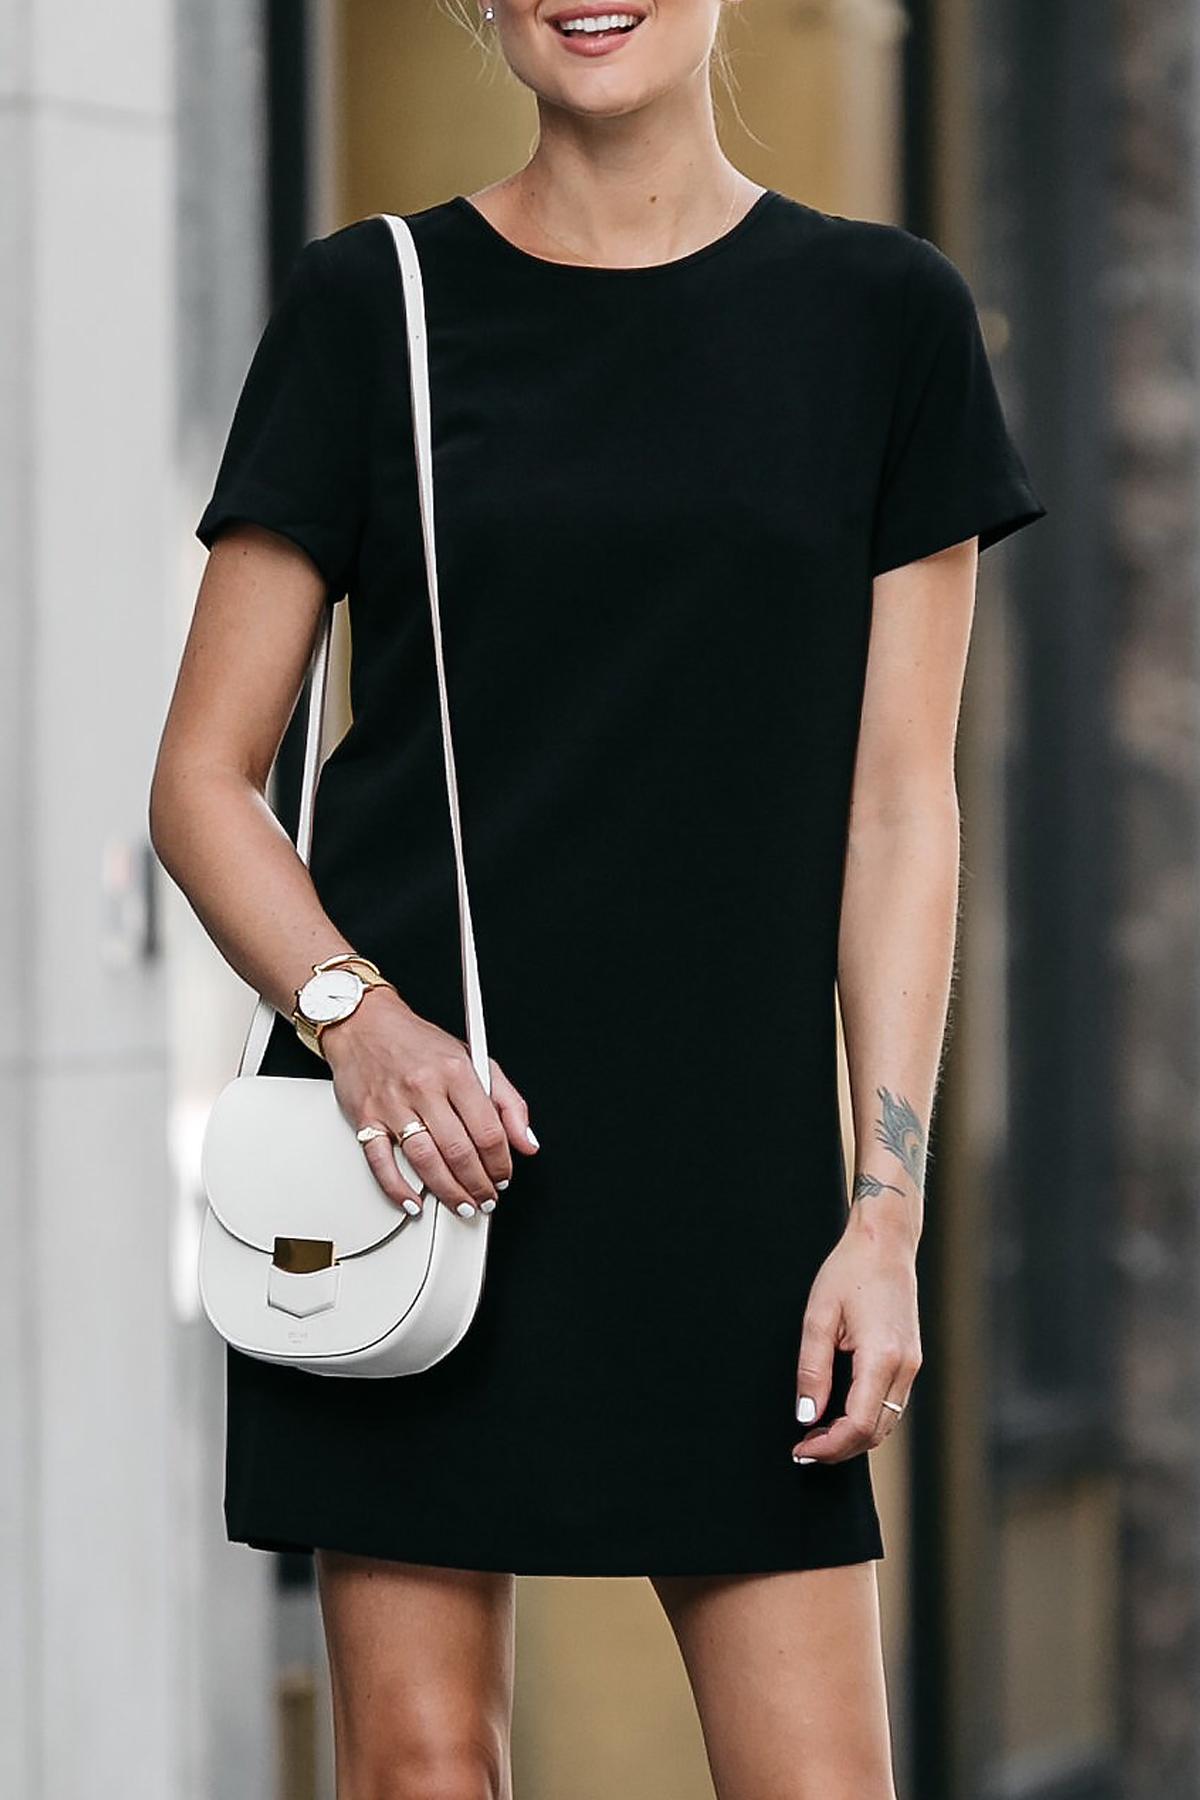 Nordstrom Black Shift Dress Outfit Celine White Trotteur Handbag Fashion Jackson Dallas Blogger Fashion Blogger Street Style